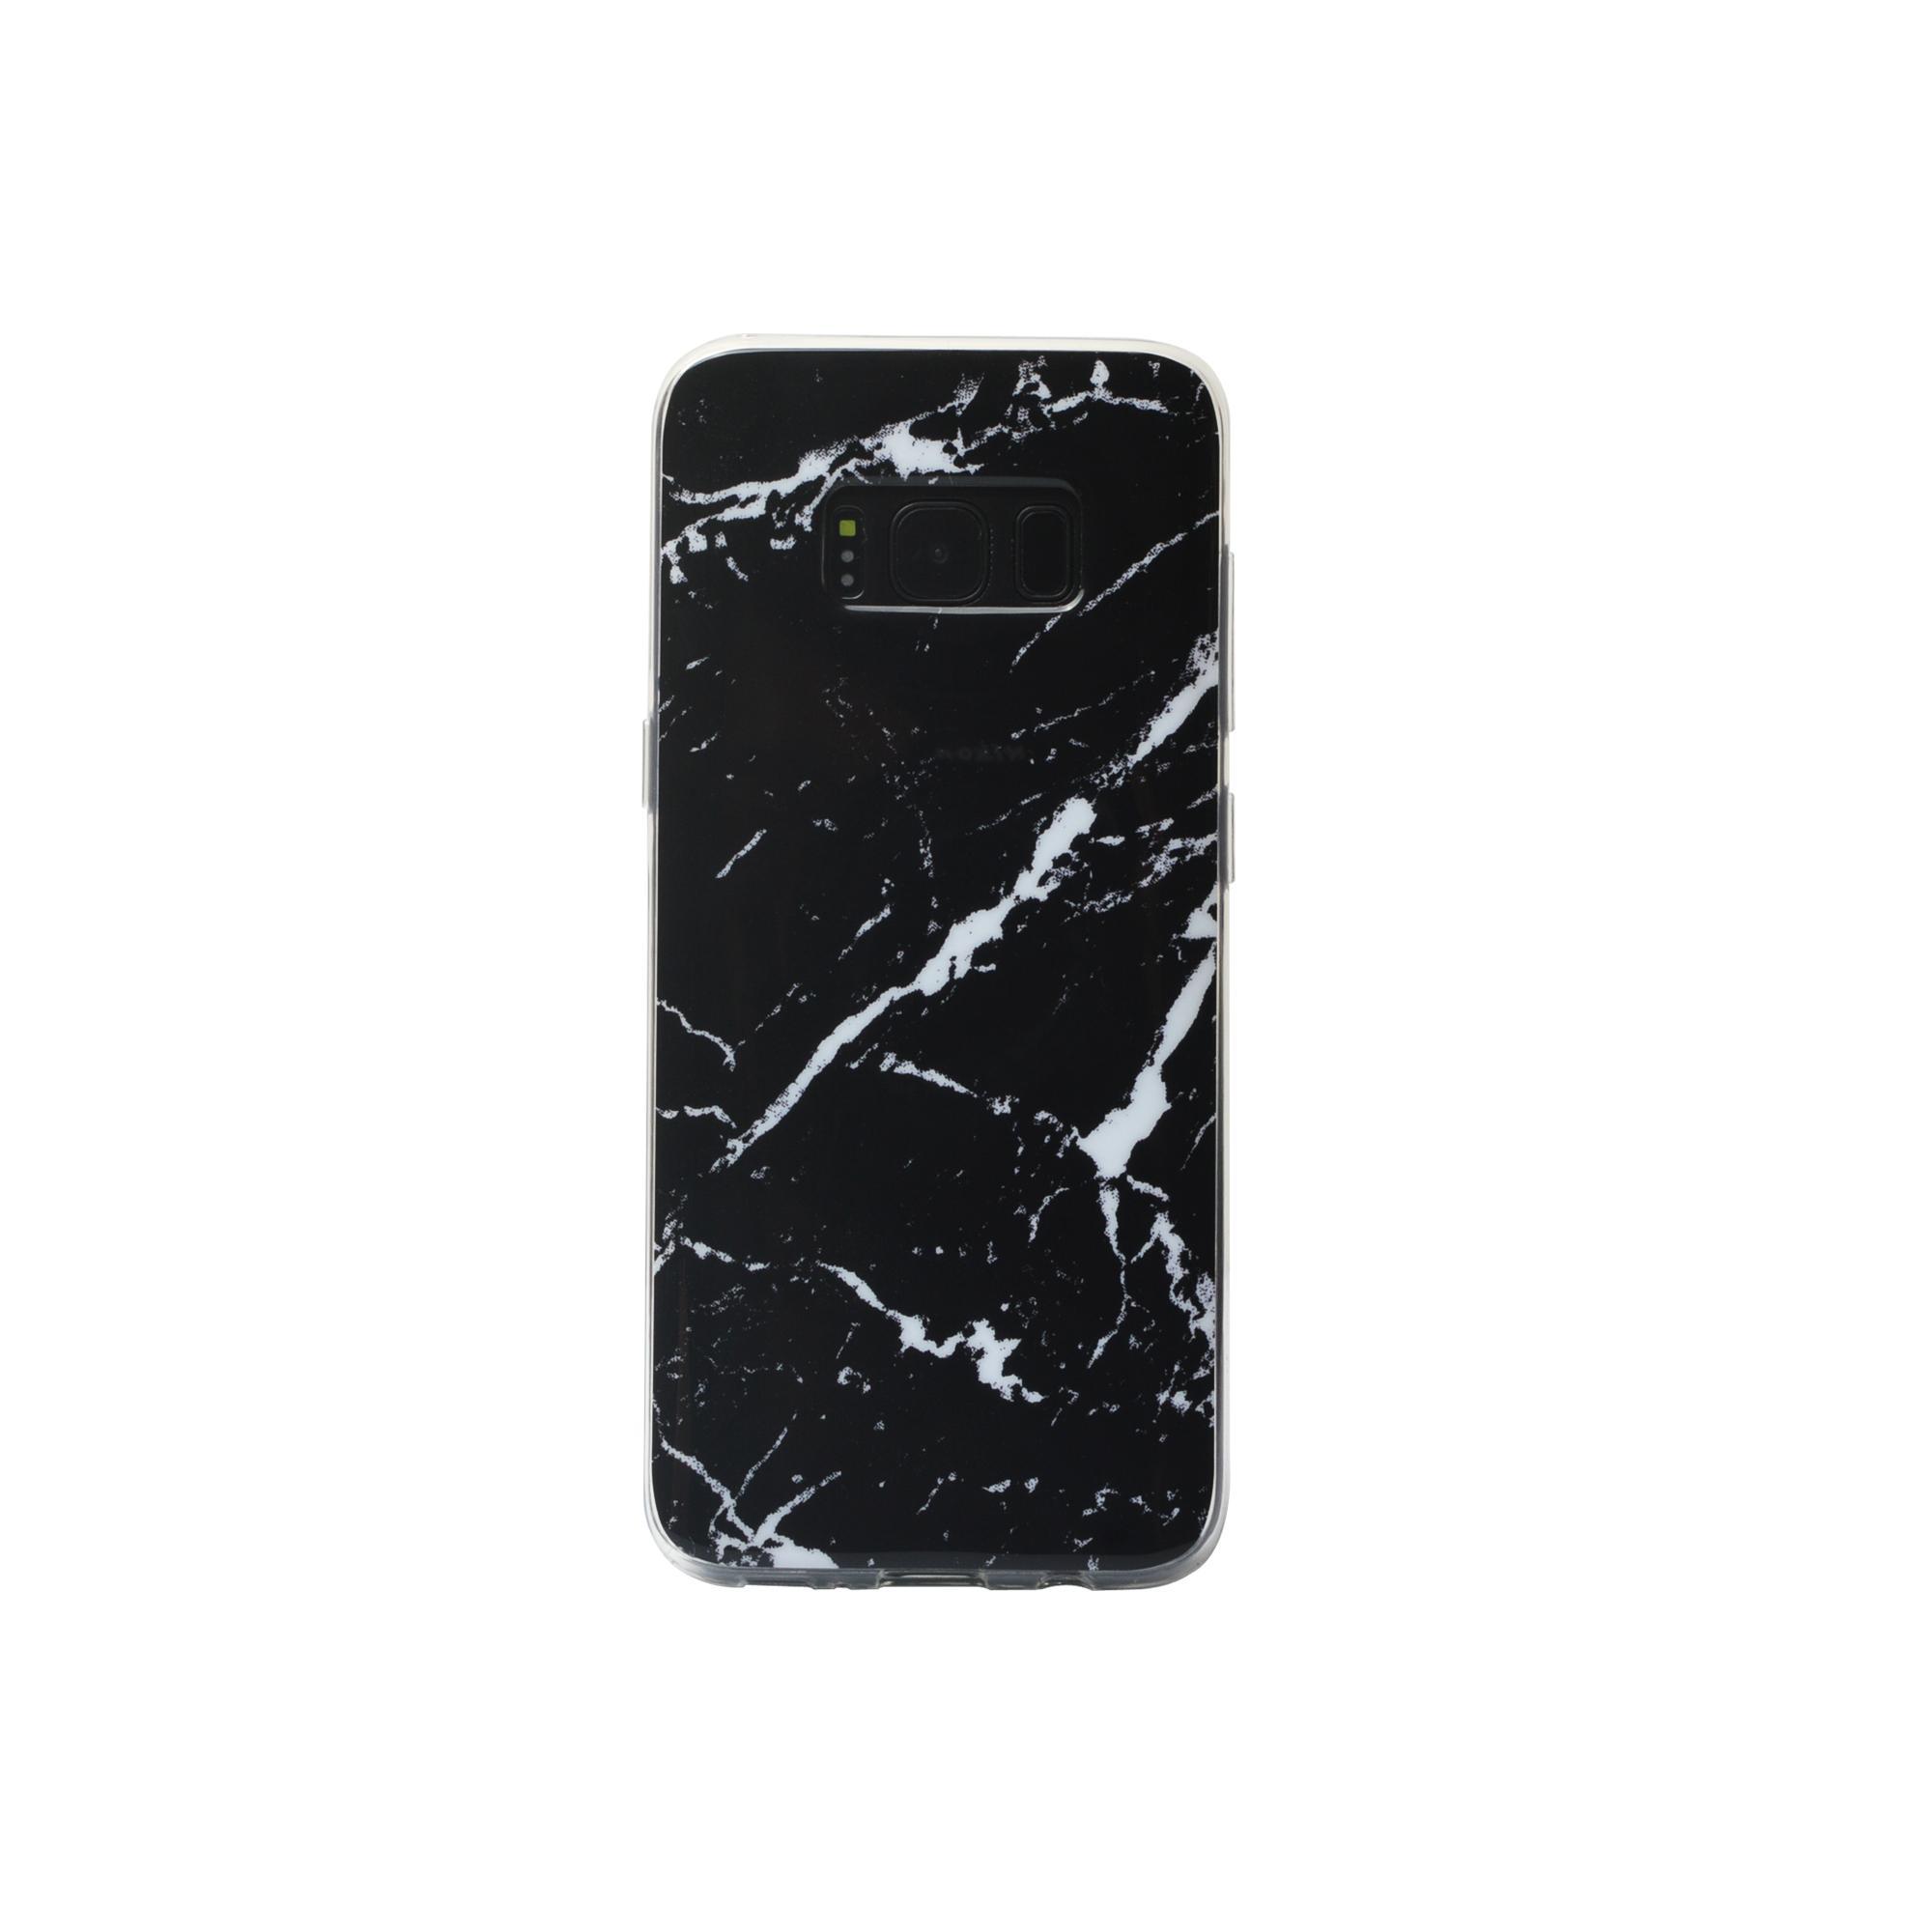 IMD Samsung Galaxy S8 Glossy Soft Marble TPU Case 7